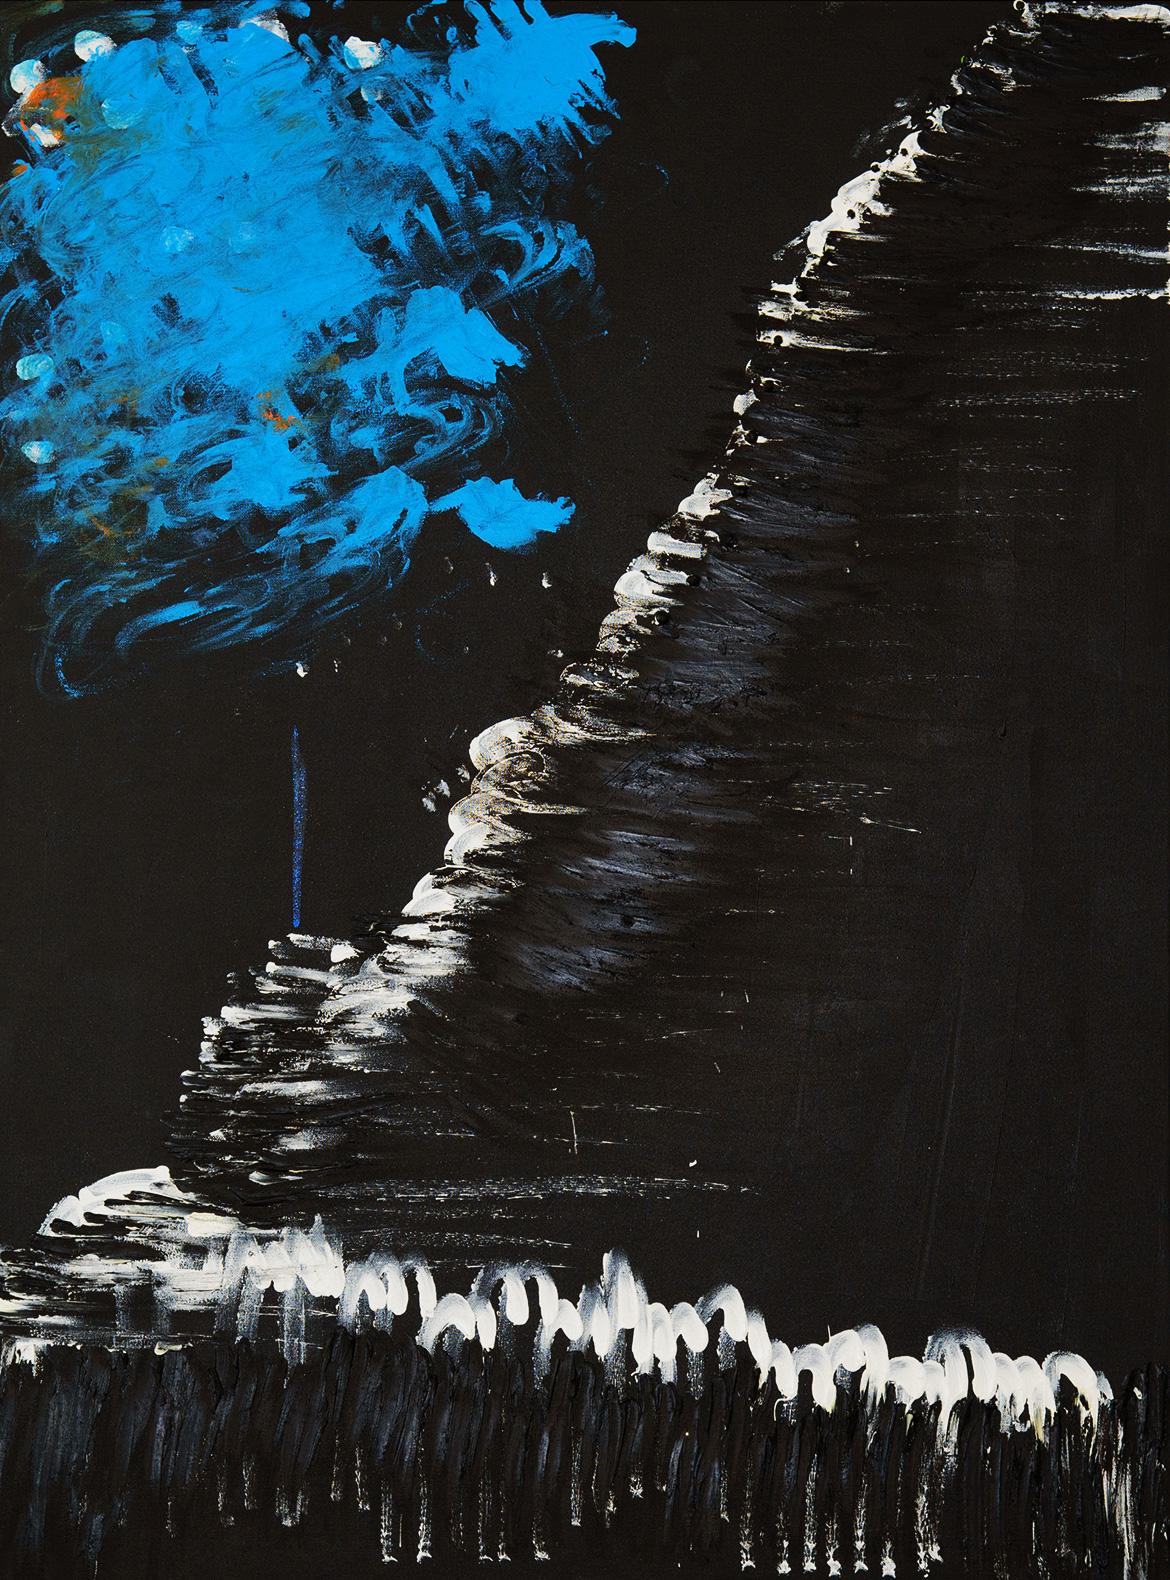 Endurance by Laura Meddens